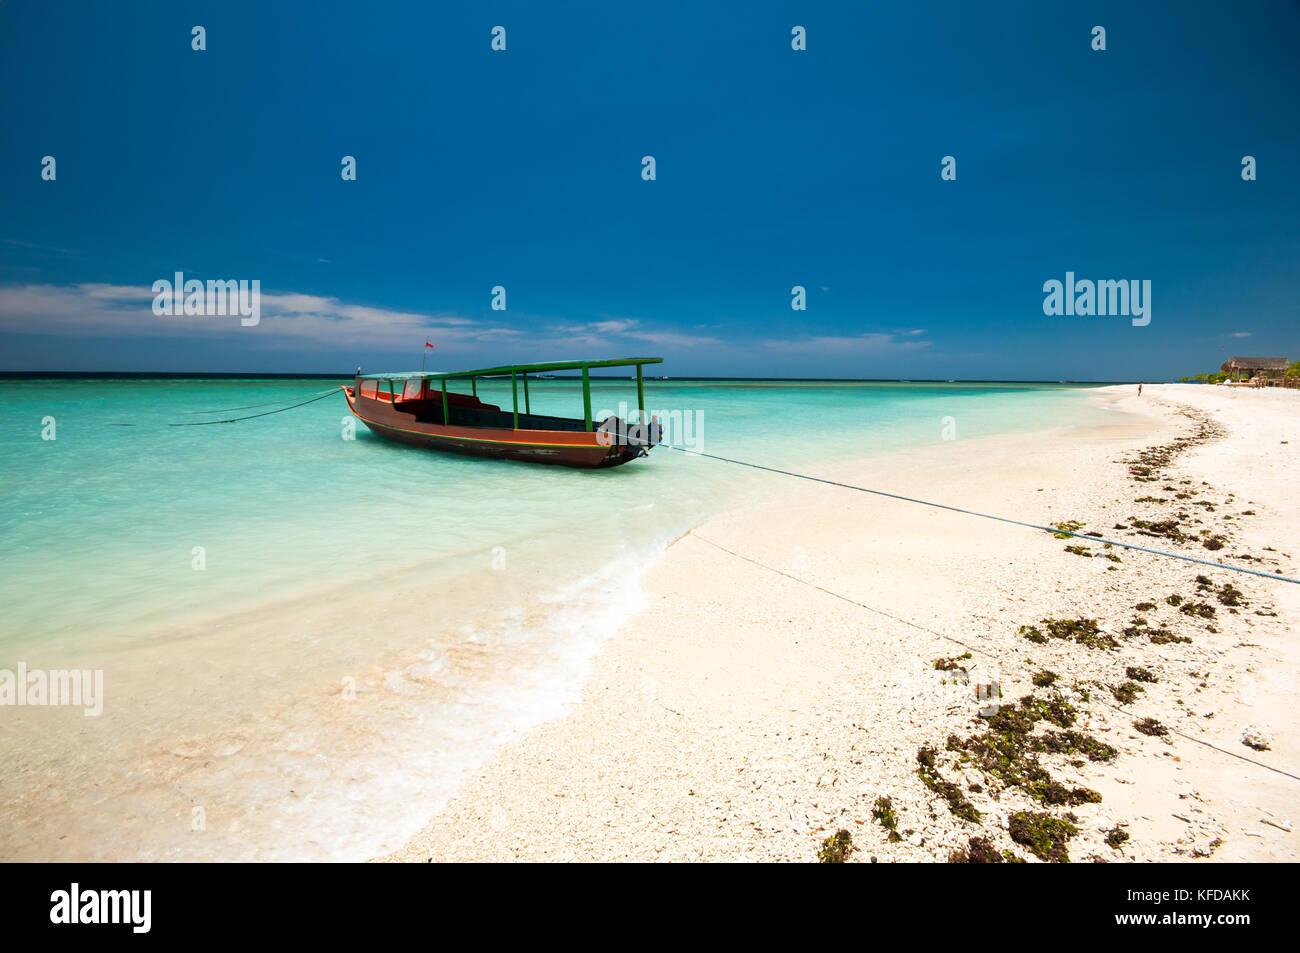 Boat on the sea, Gili Meno Island, Lombok, Indonesia - Stock Image